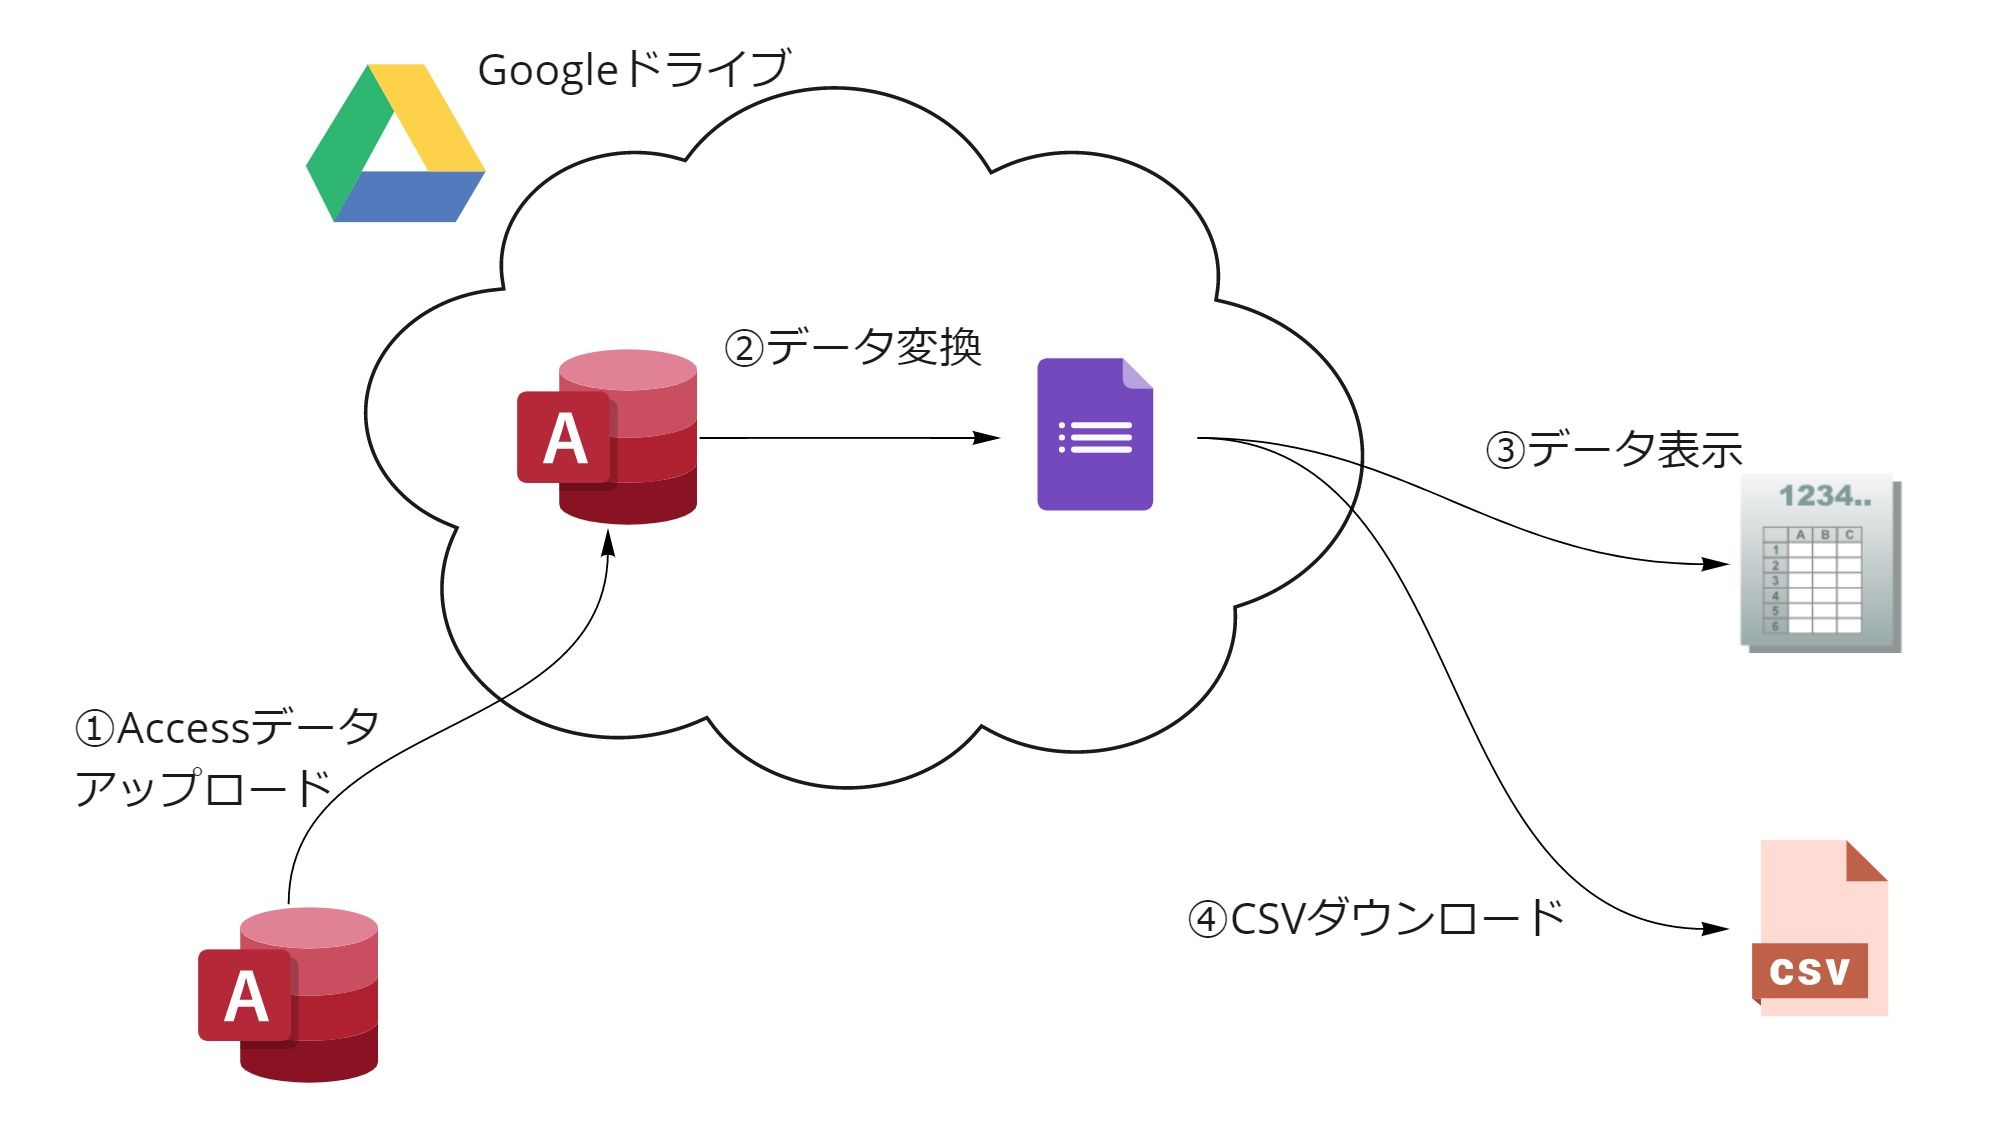 Google Drive + MDB,ACCDB Viwerのイメージ図